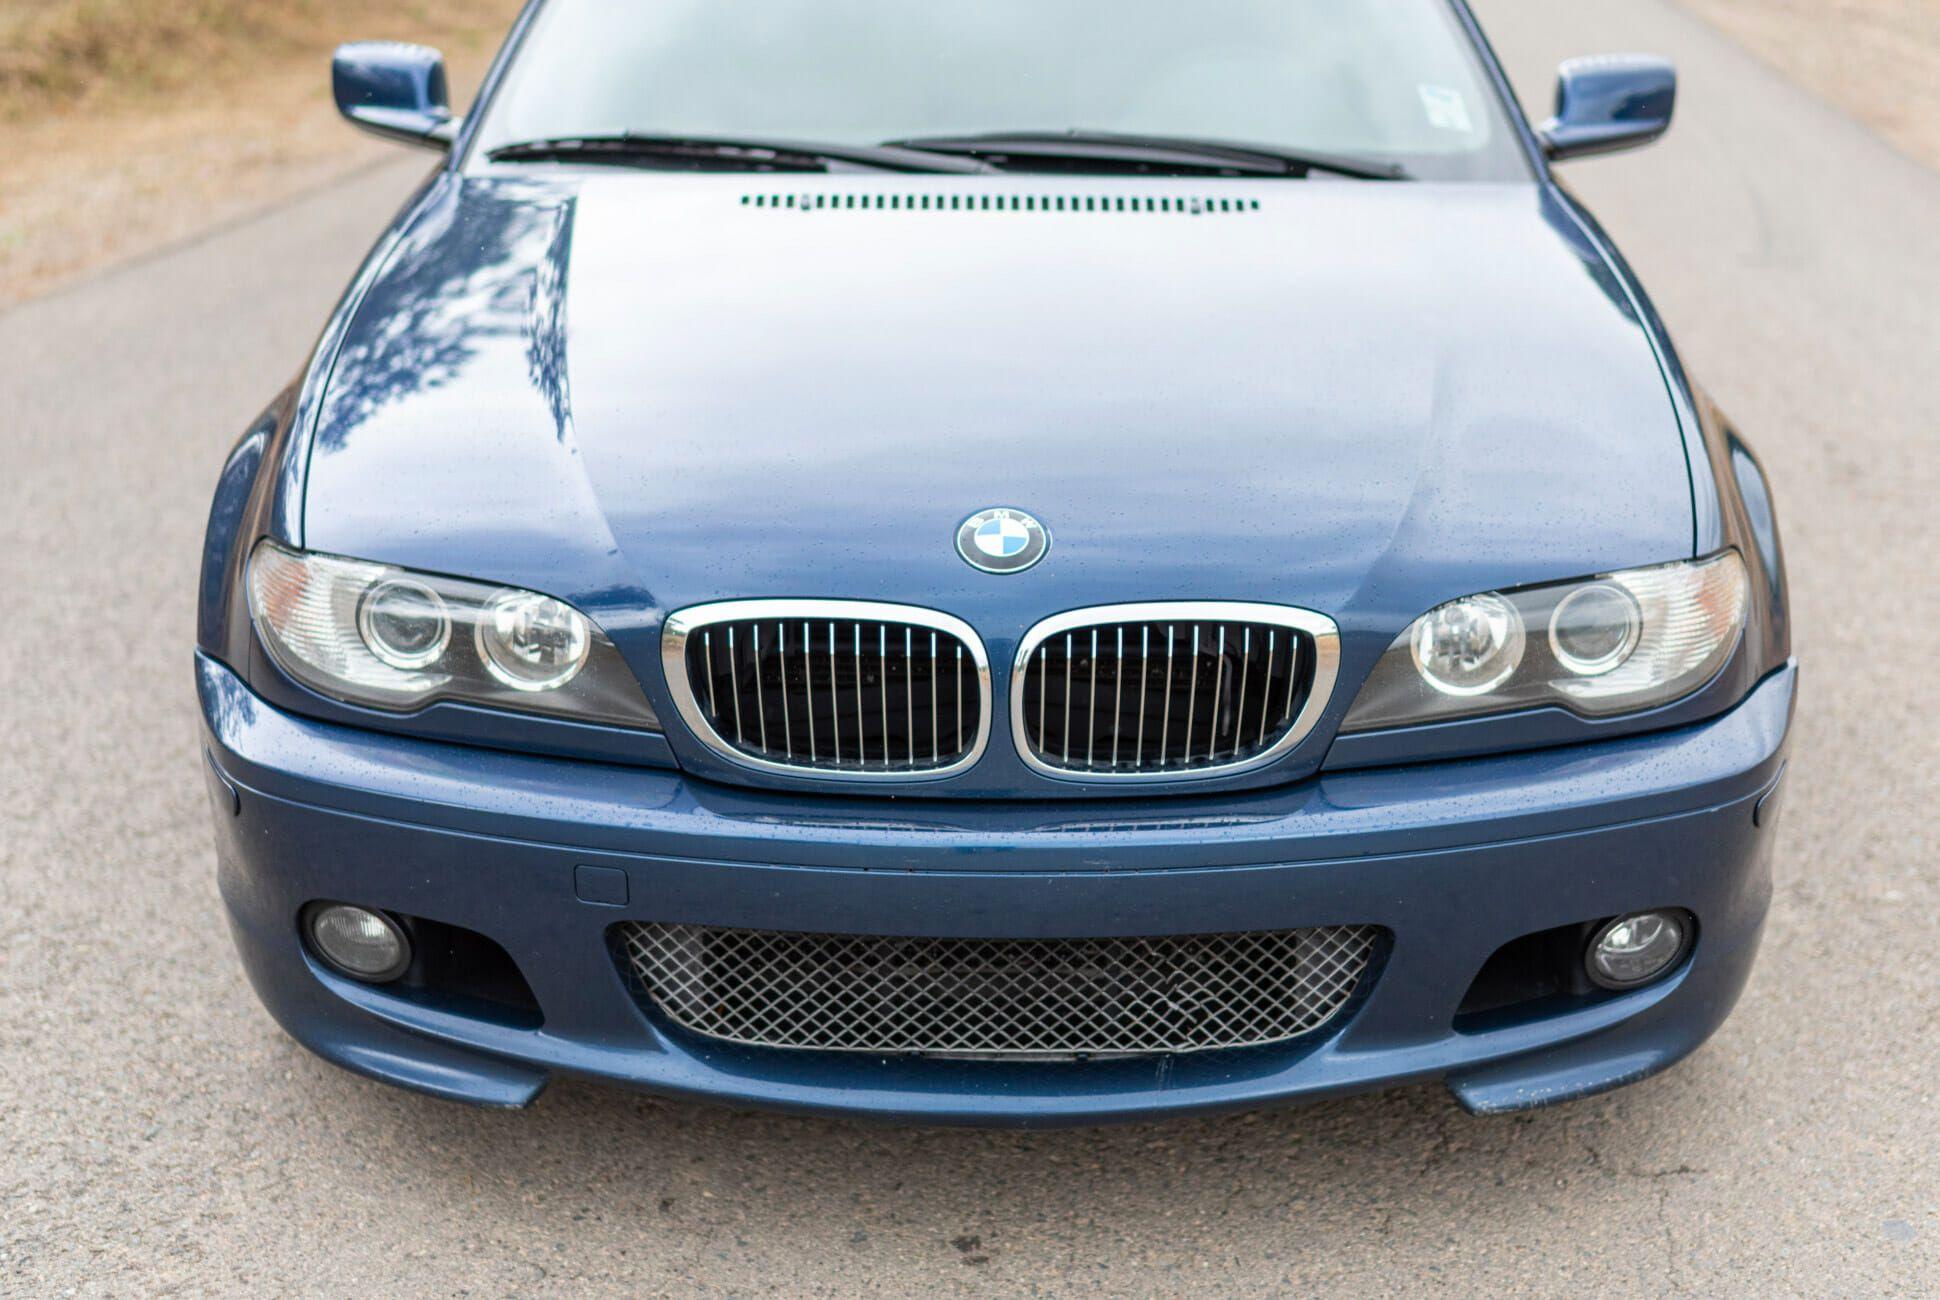 2004-BMW-330Ci-ZHP-6-Speed-gear-patrol-slide-04